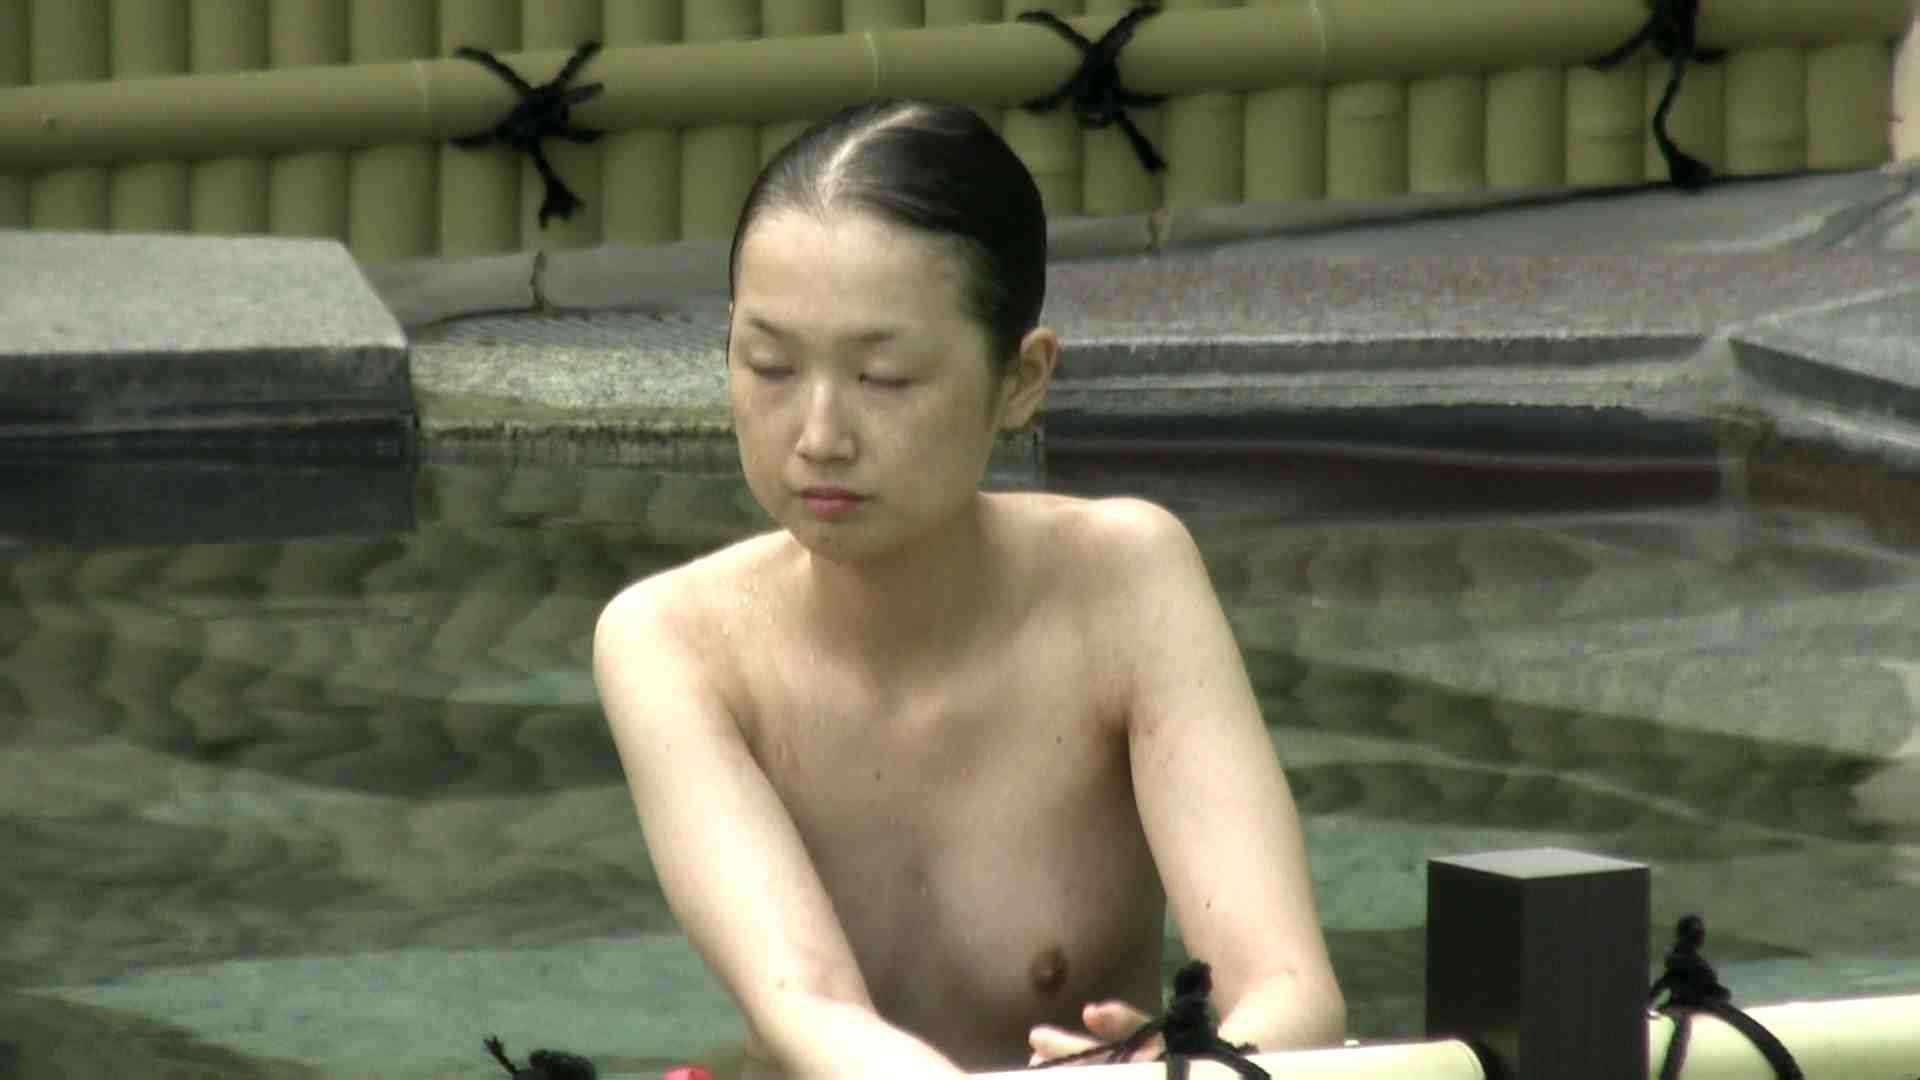 Aquaな露天風呂Vol.661 0 | 0  23連発 5